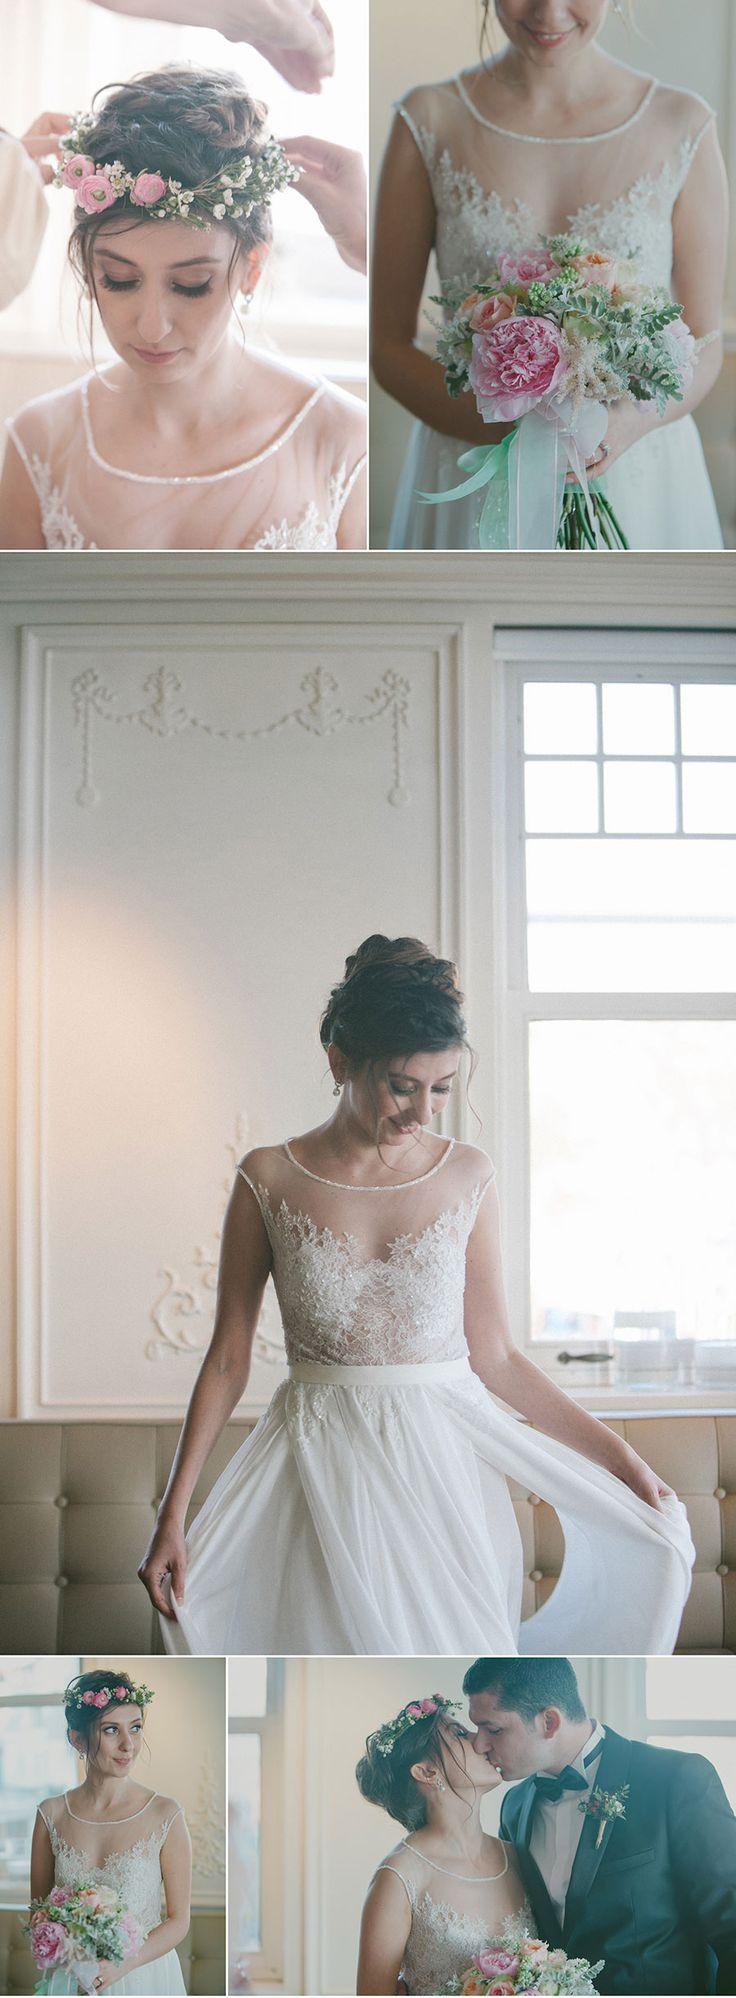 Fidan Kandemir Düğün Fotoğrafçısı Wedding Photographer İstanbul | Miray and Timur | http://www.fidankandemir.com